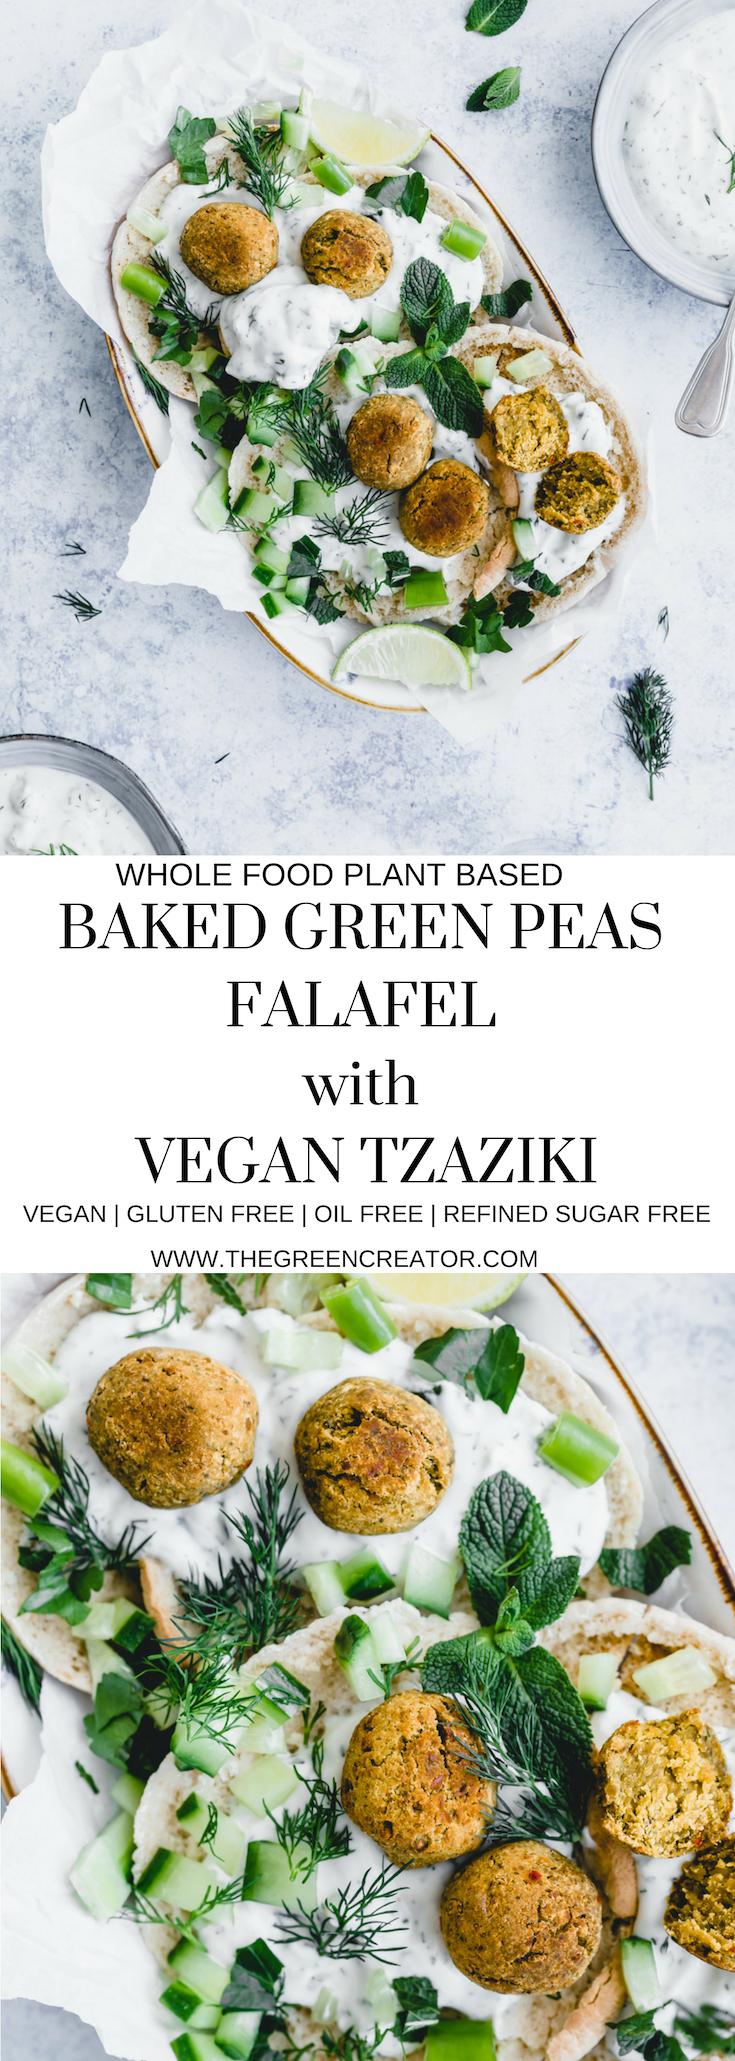 Baked Green Peas Falafel with Vegan Tzatziki